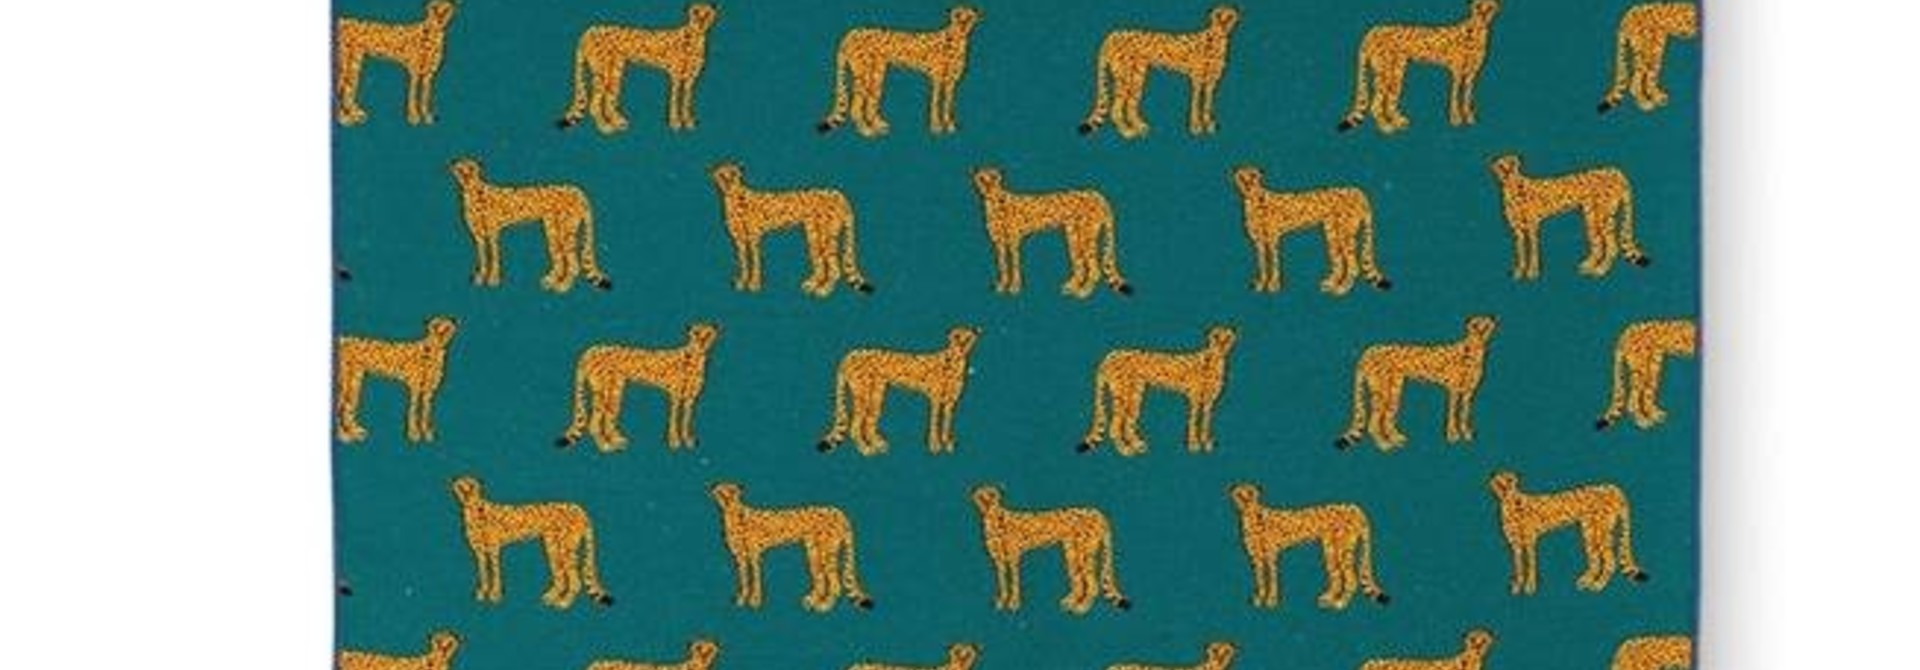 Fabienne Chapot Tea Towel Cheetah